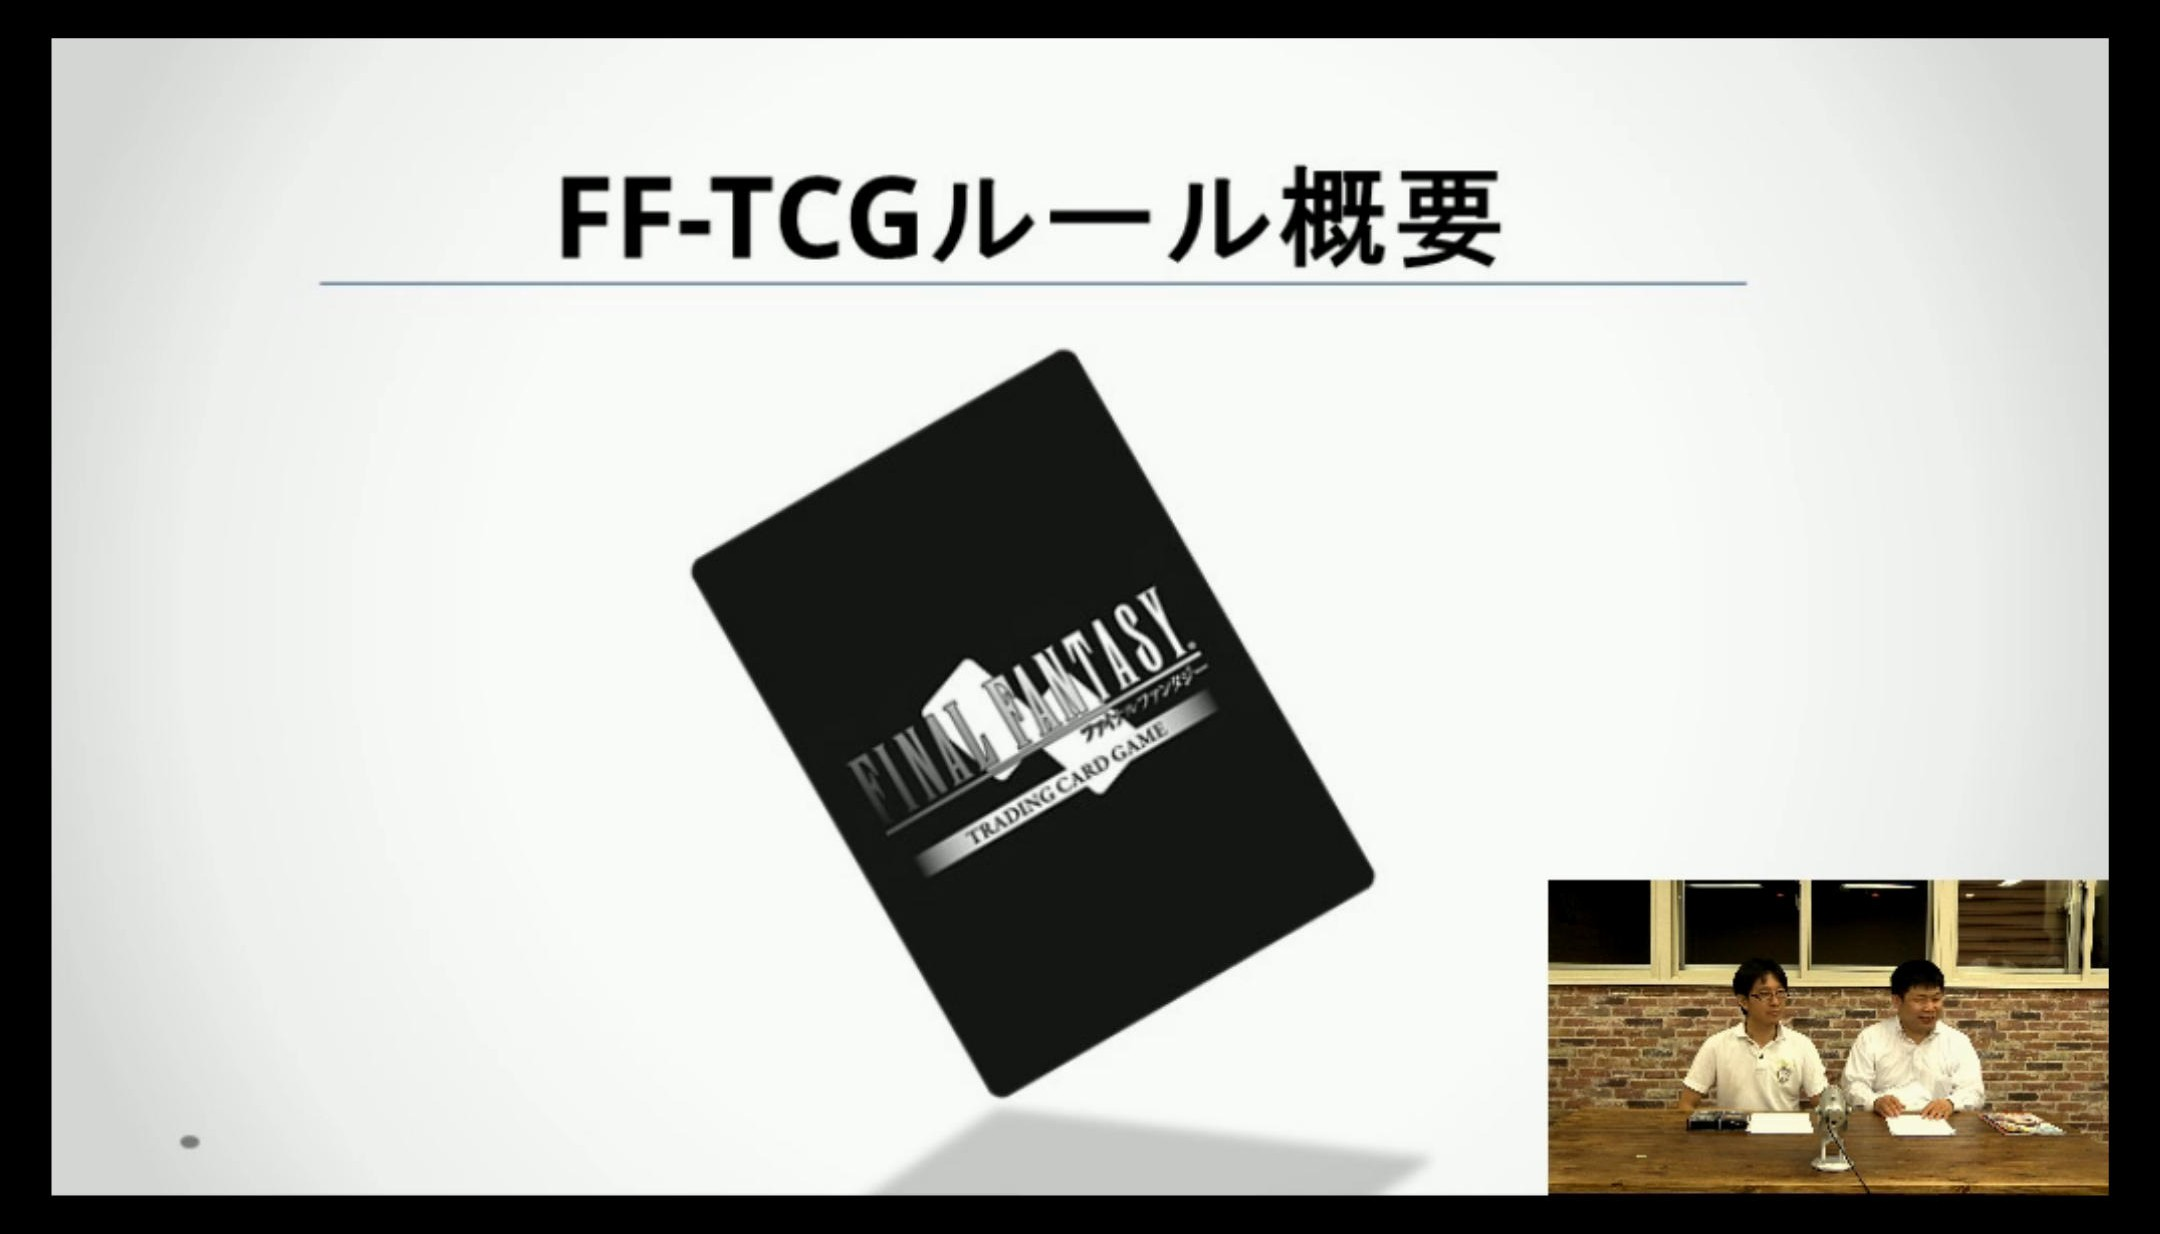 fftcg-live-170531-000.jpg